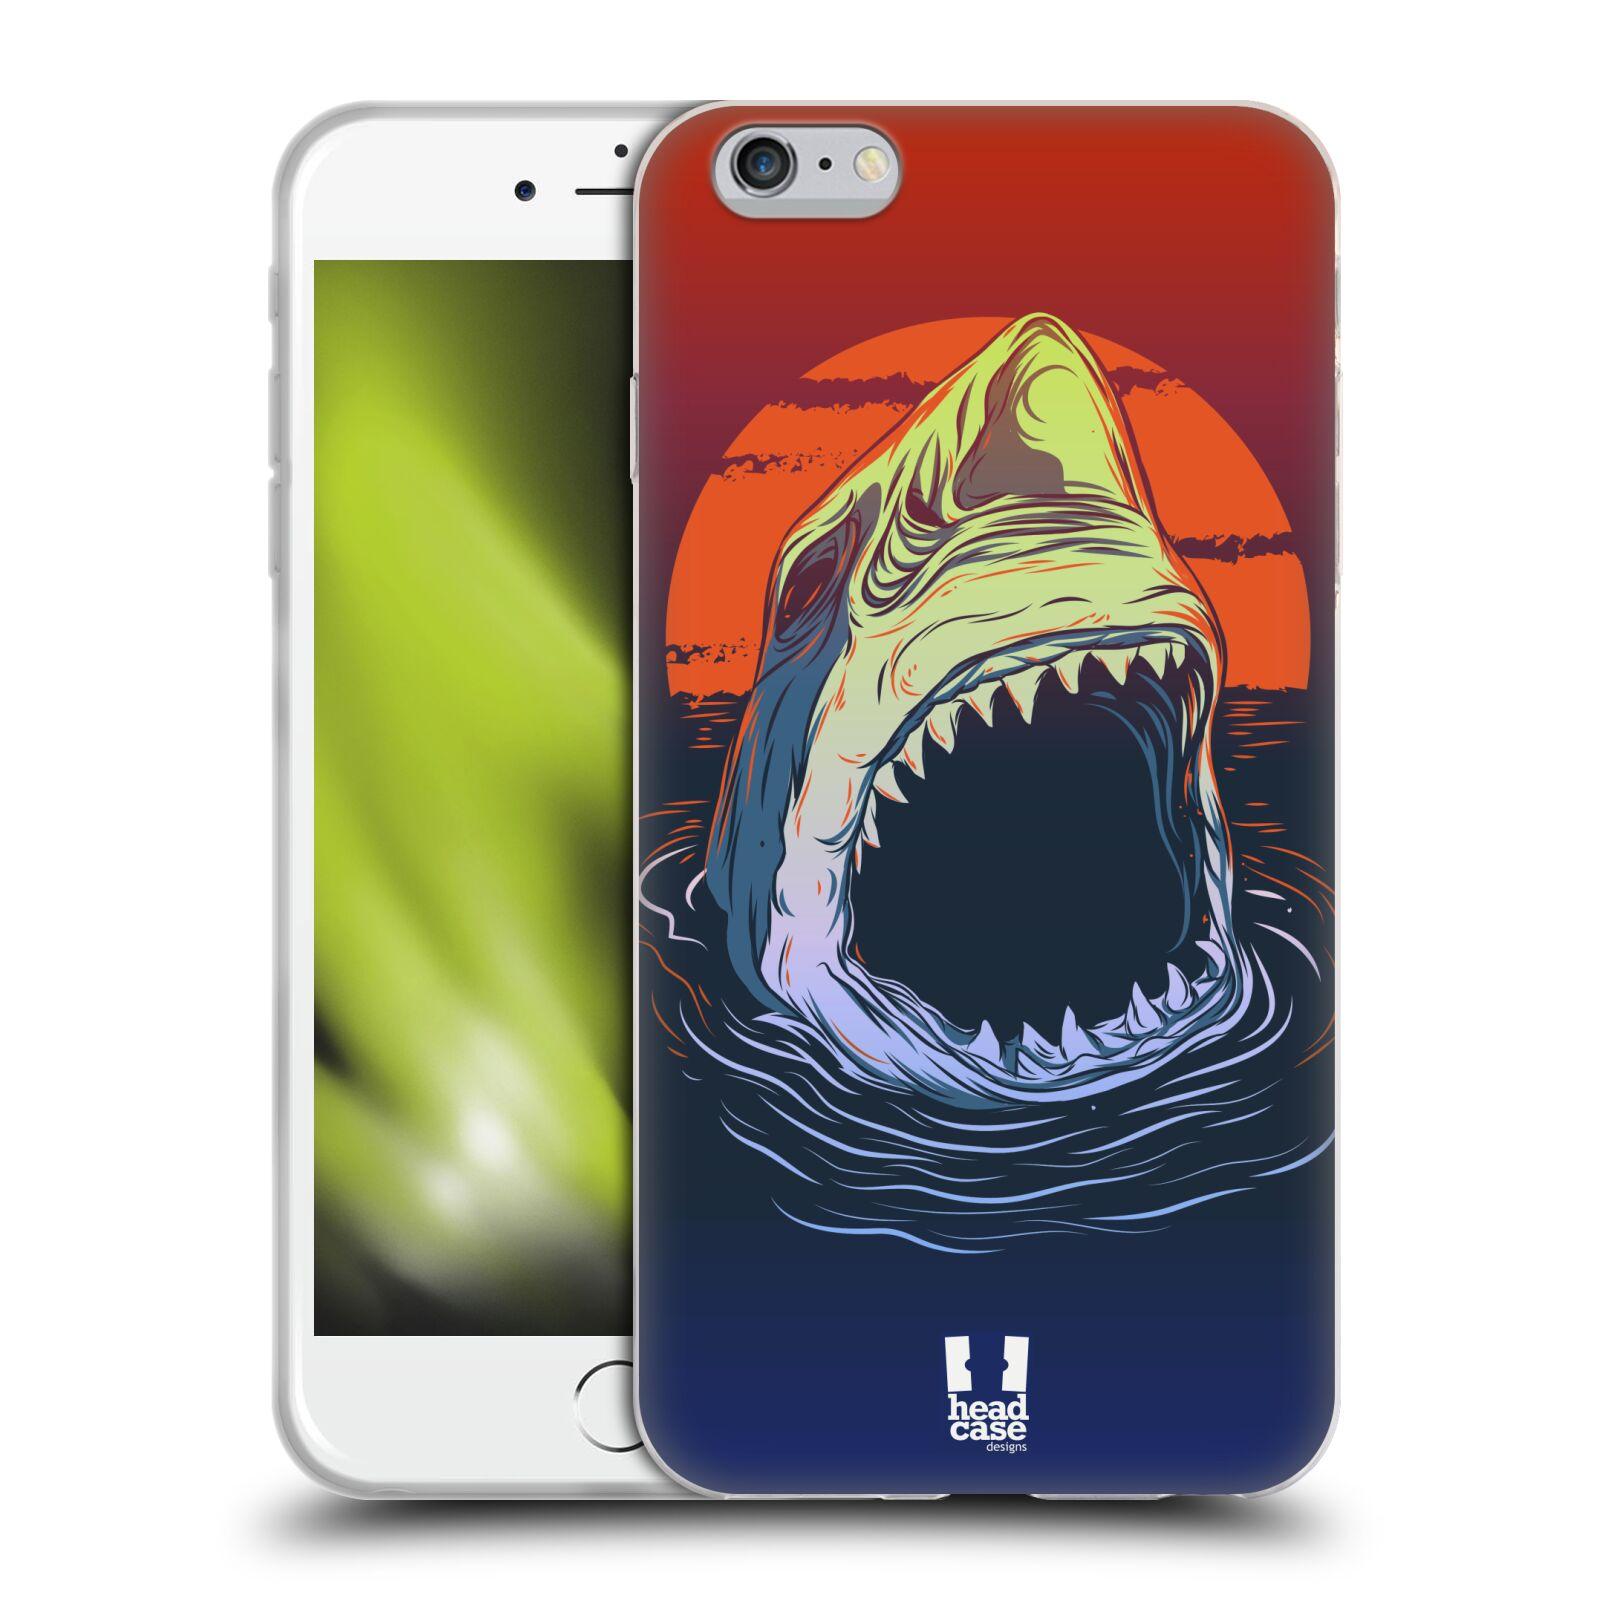 HEAD CASE silikonový obal na mobil Apple Iphone 6 PLUS/ 6S PLUS vzor mořská monstra žralok